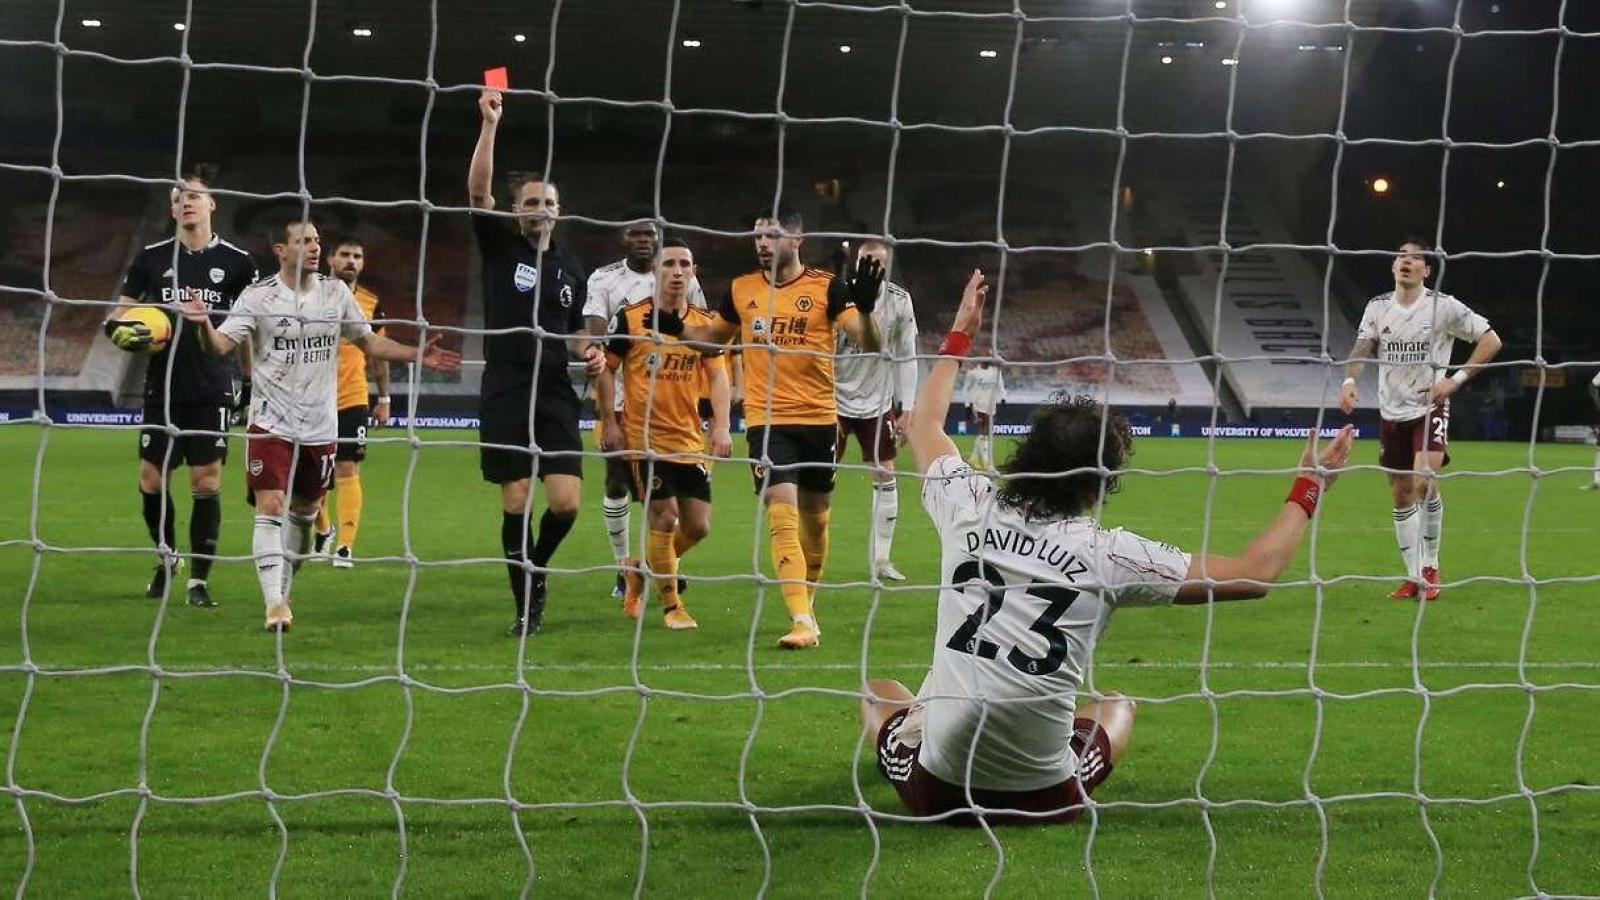 HLV Arteta bức xúc khi David Luiz bị thẻ đỏ trận Arsenal thua Wolves